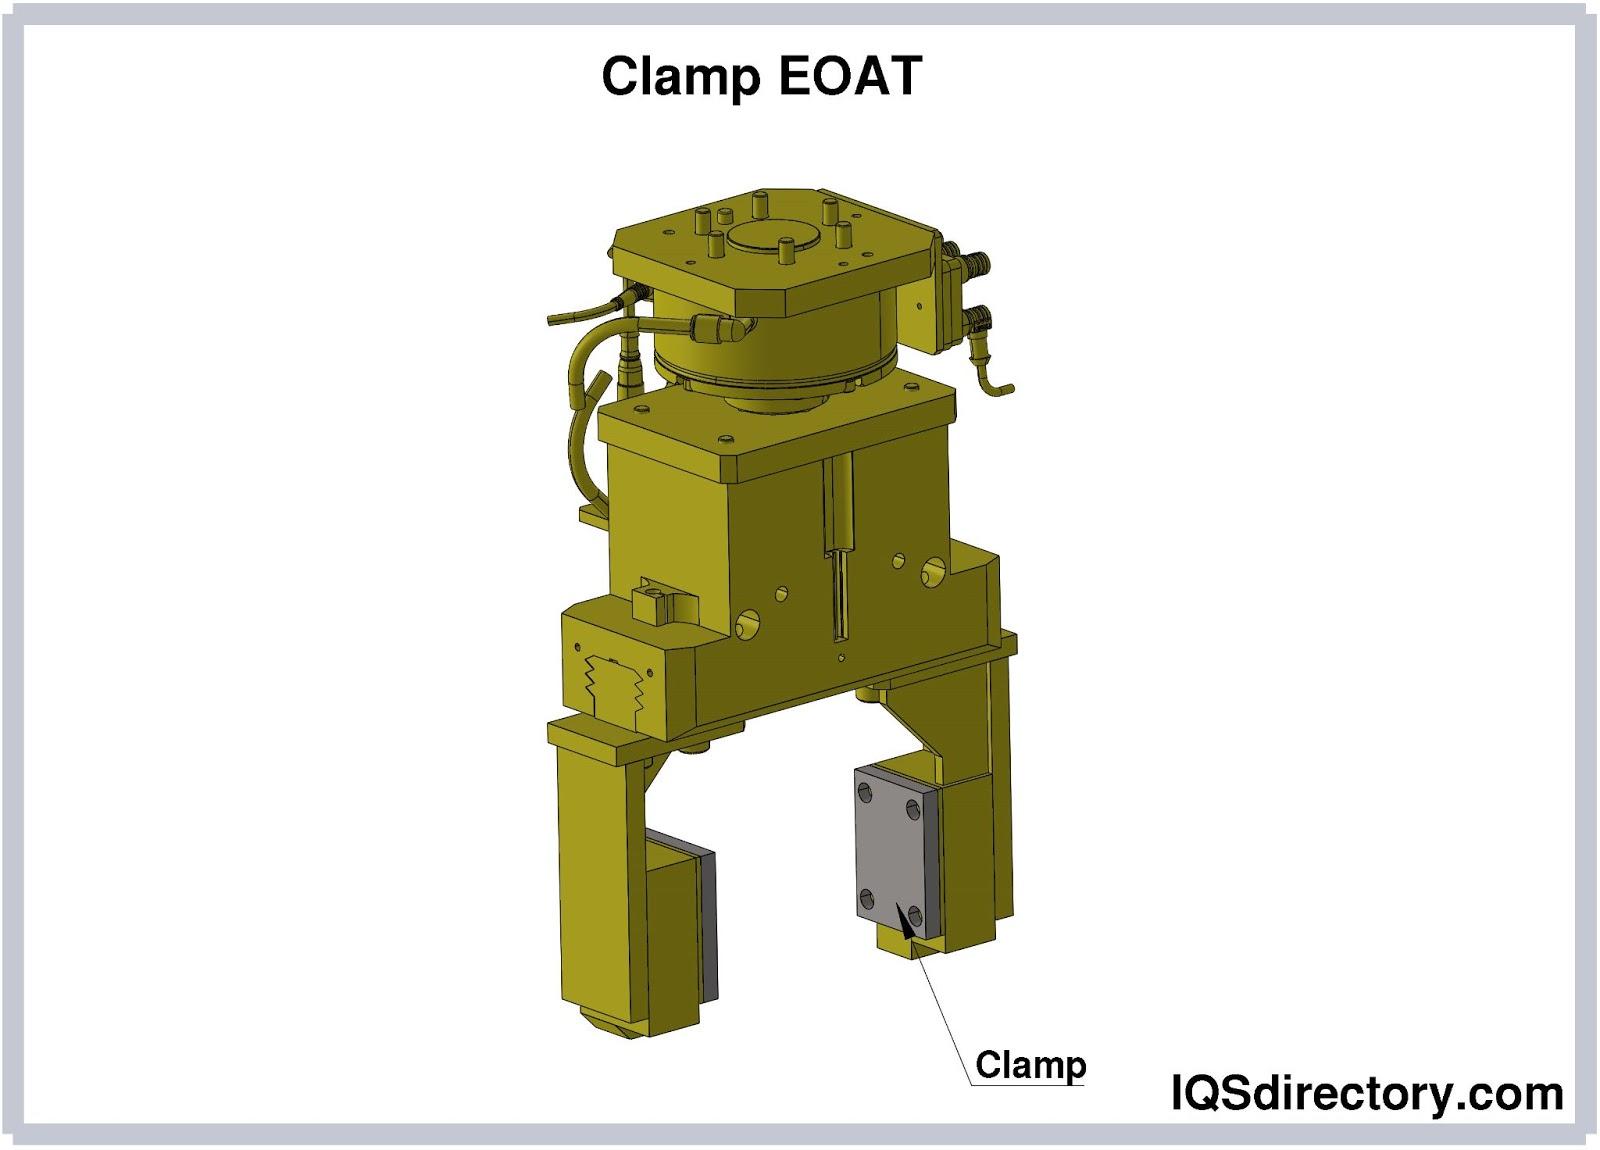 Clamp EOAT